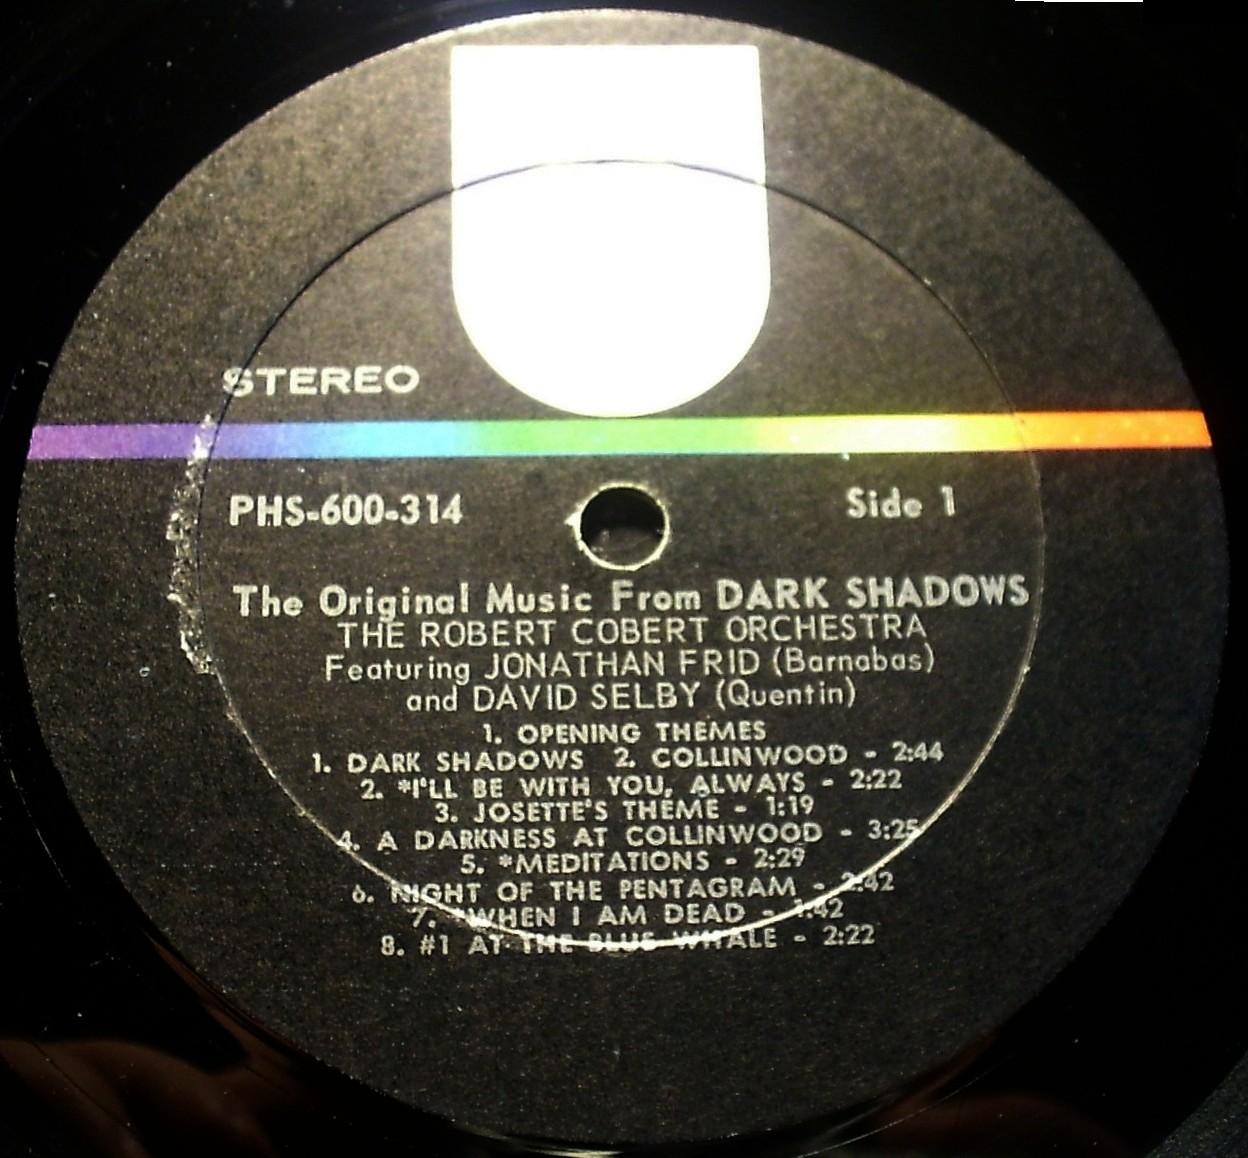 recordo obscura  the soundtrack of nobodys life  THE ORIGINAL